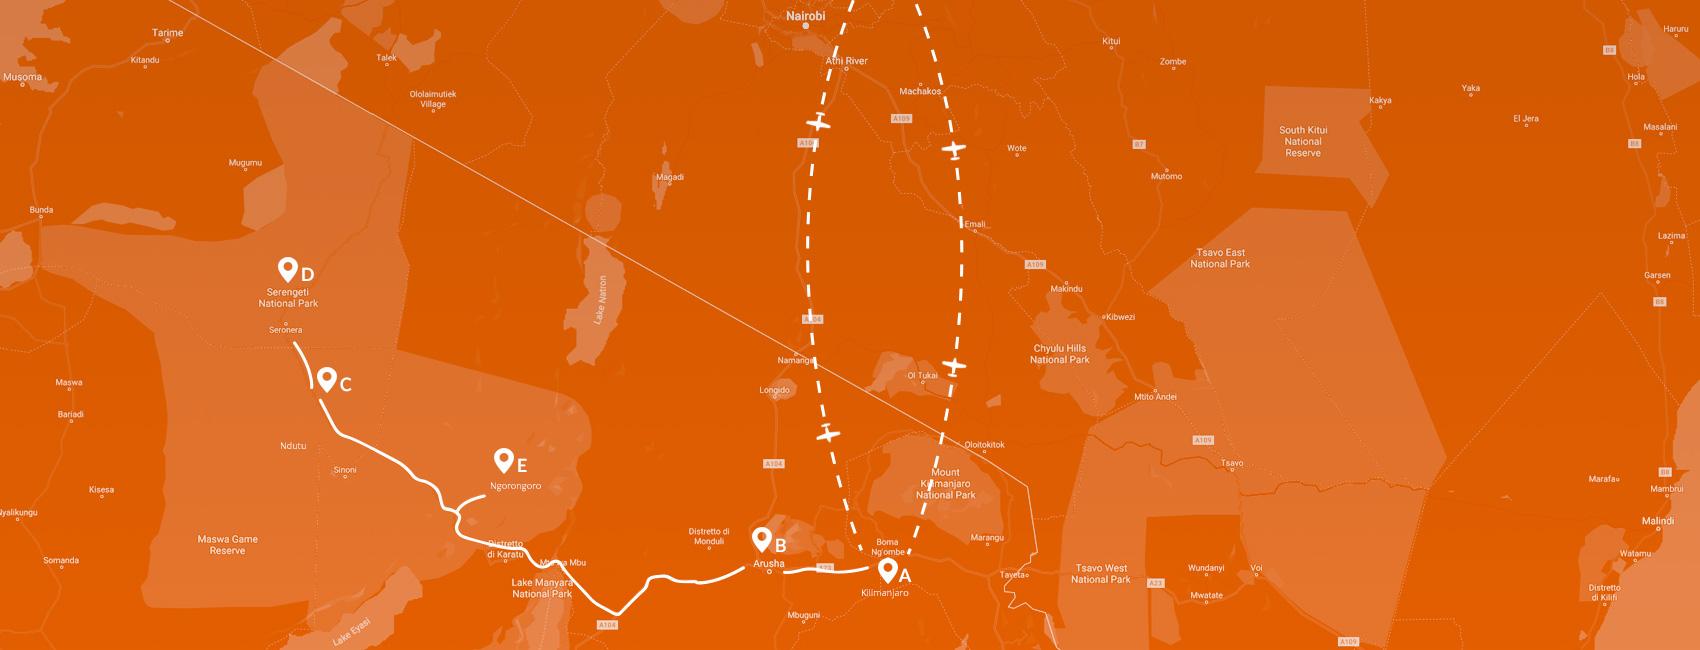 Maps - Tanzania - Nascita degli gnu